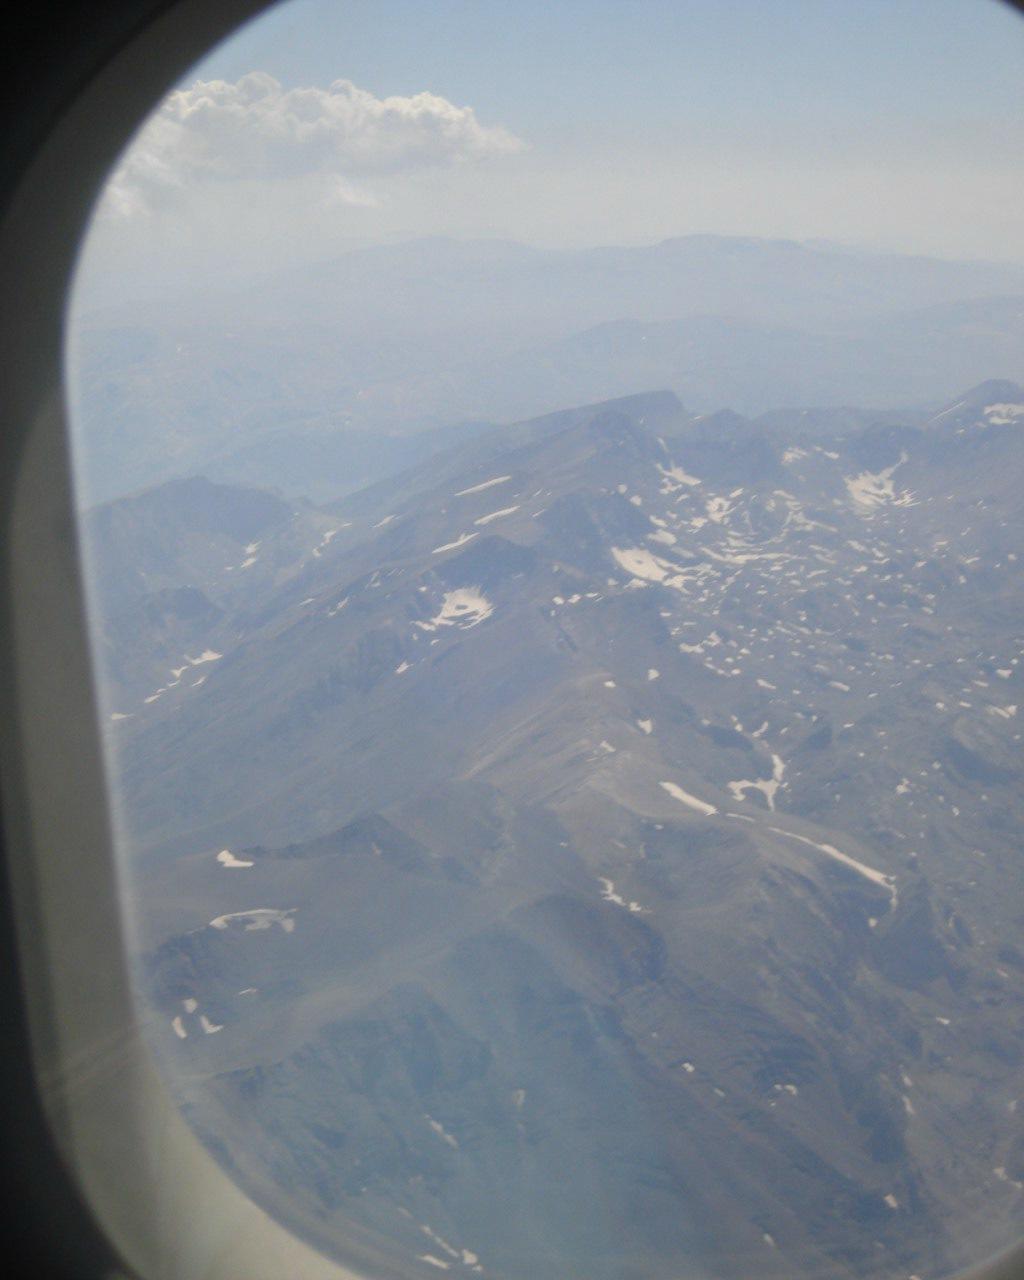 Istanbul-Adana flight